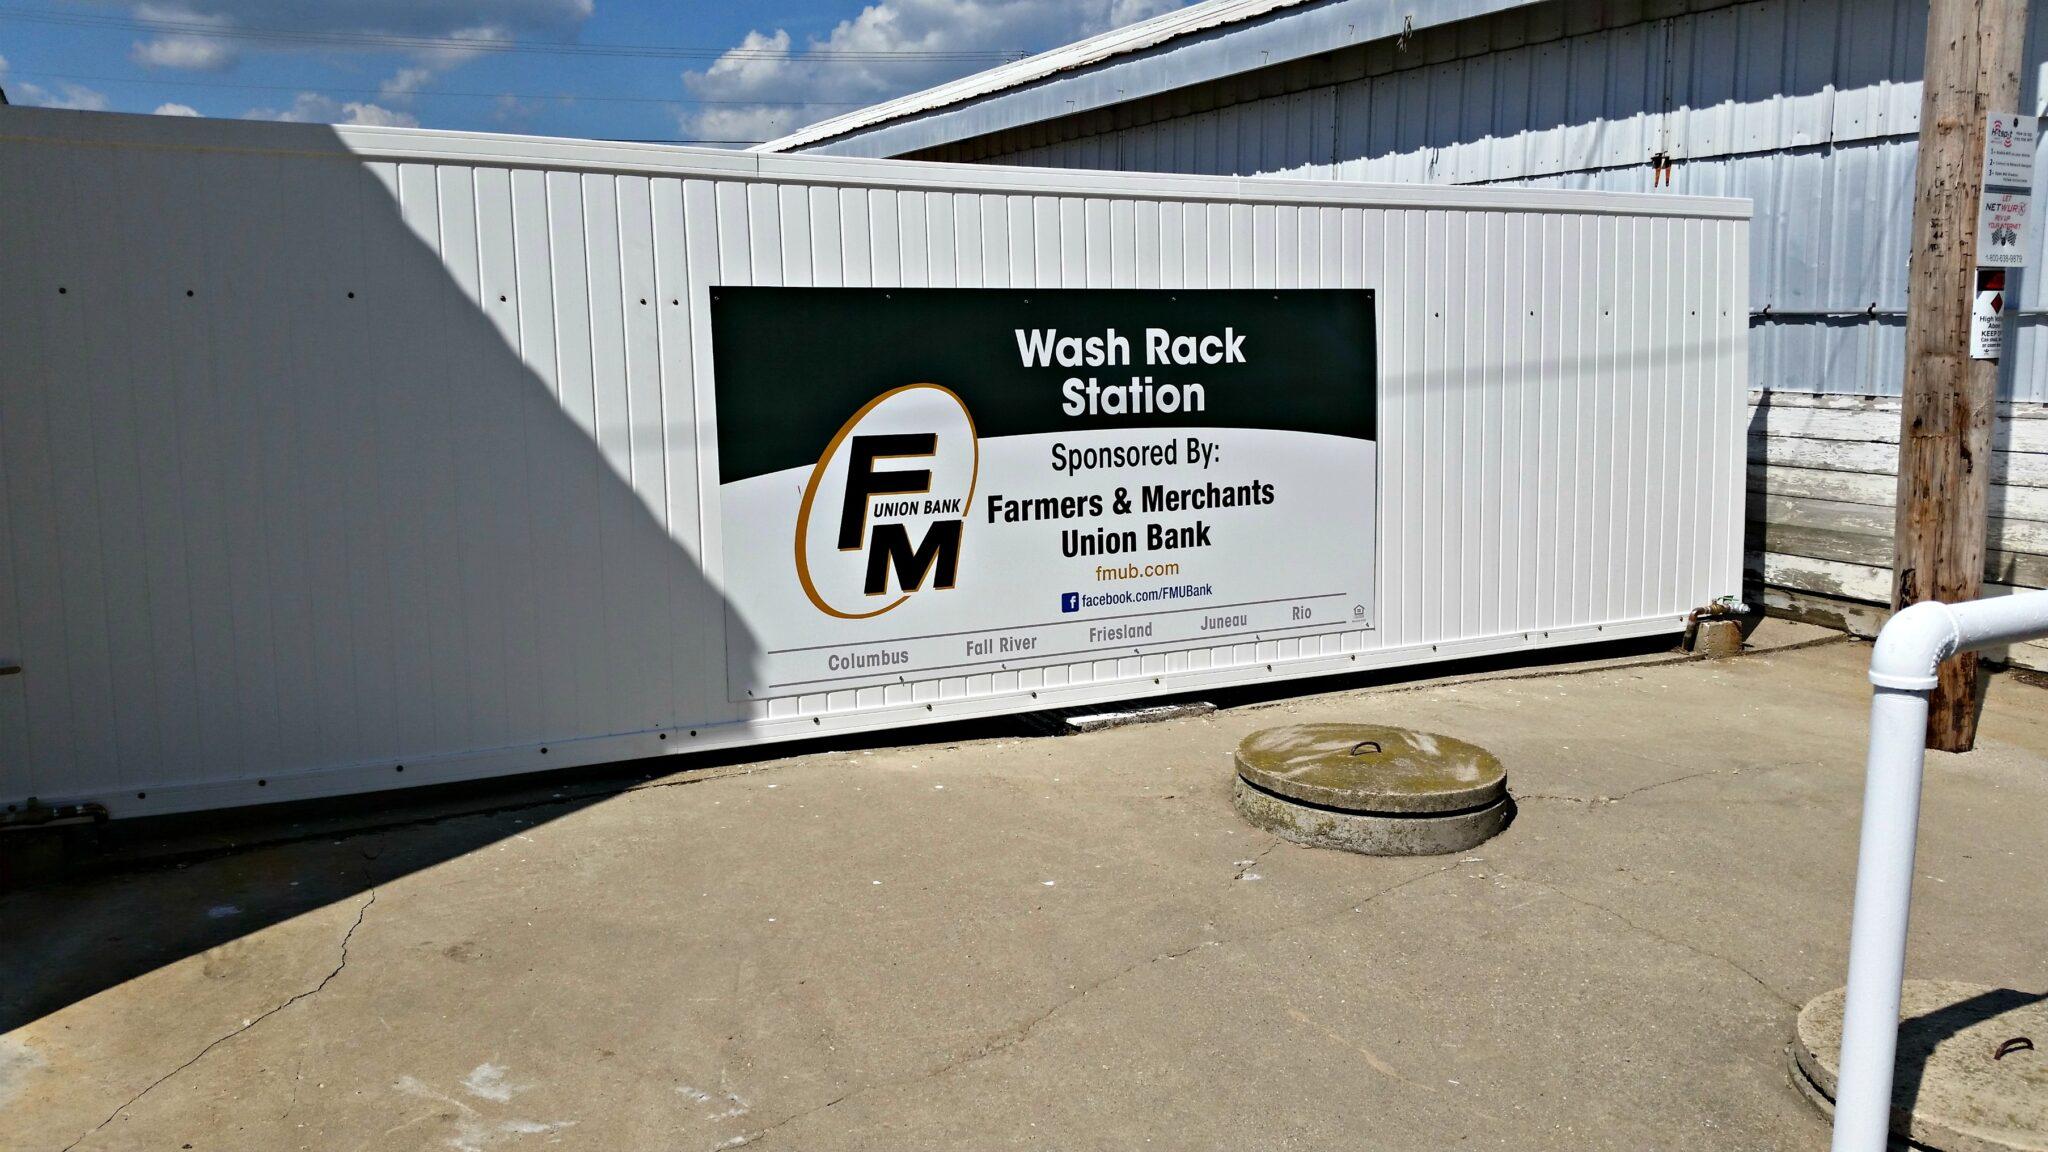 Farmers & Merchants Union Bank Wash Rack Station Sponsorship